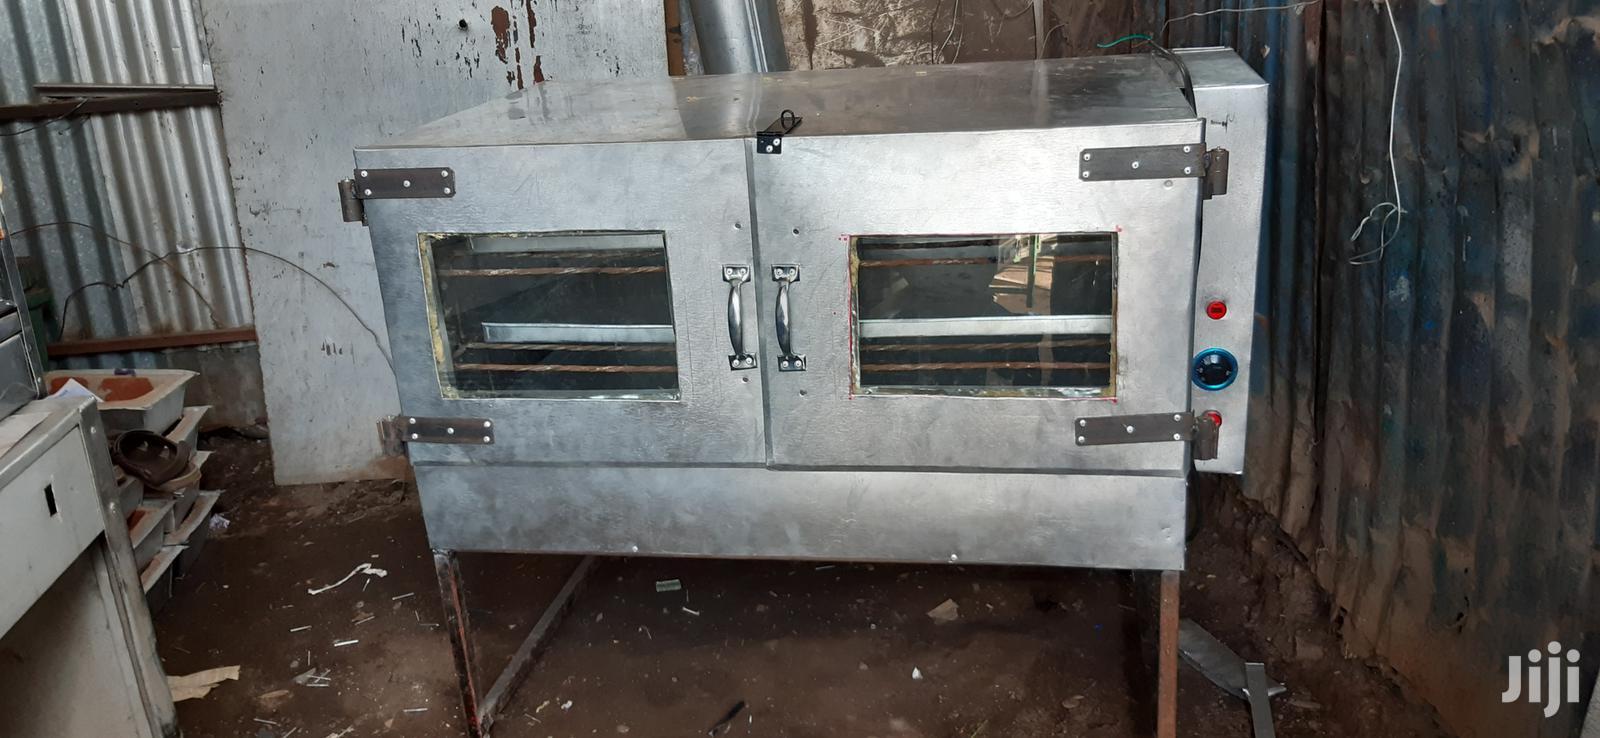 Electric Baking Oven | Kitchen Appliances for sale in Pumwani, Nairobi, Kenya